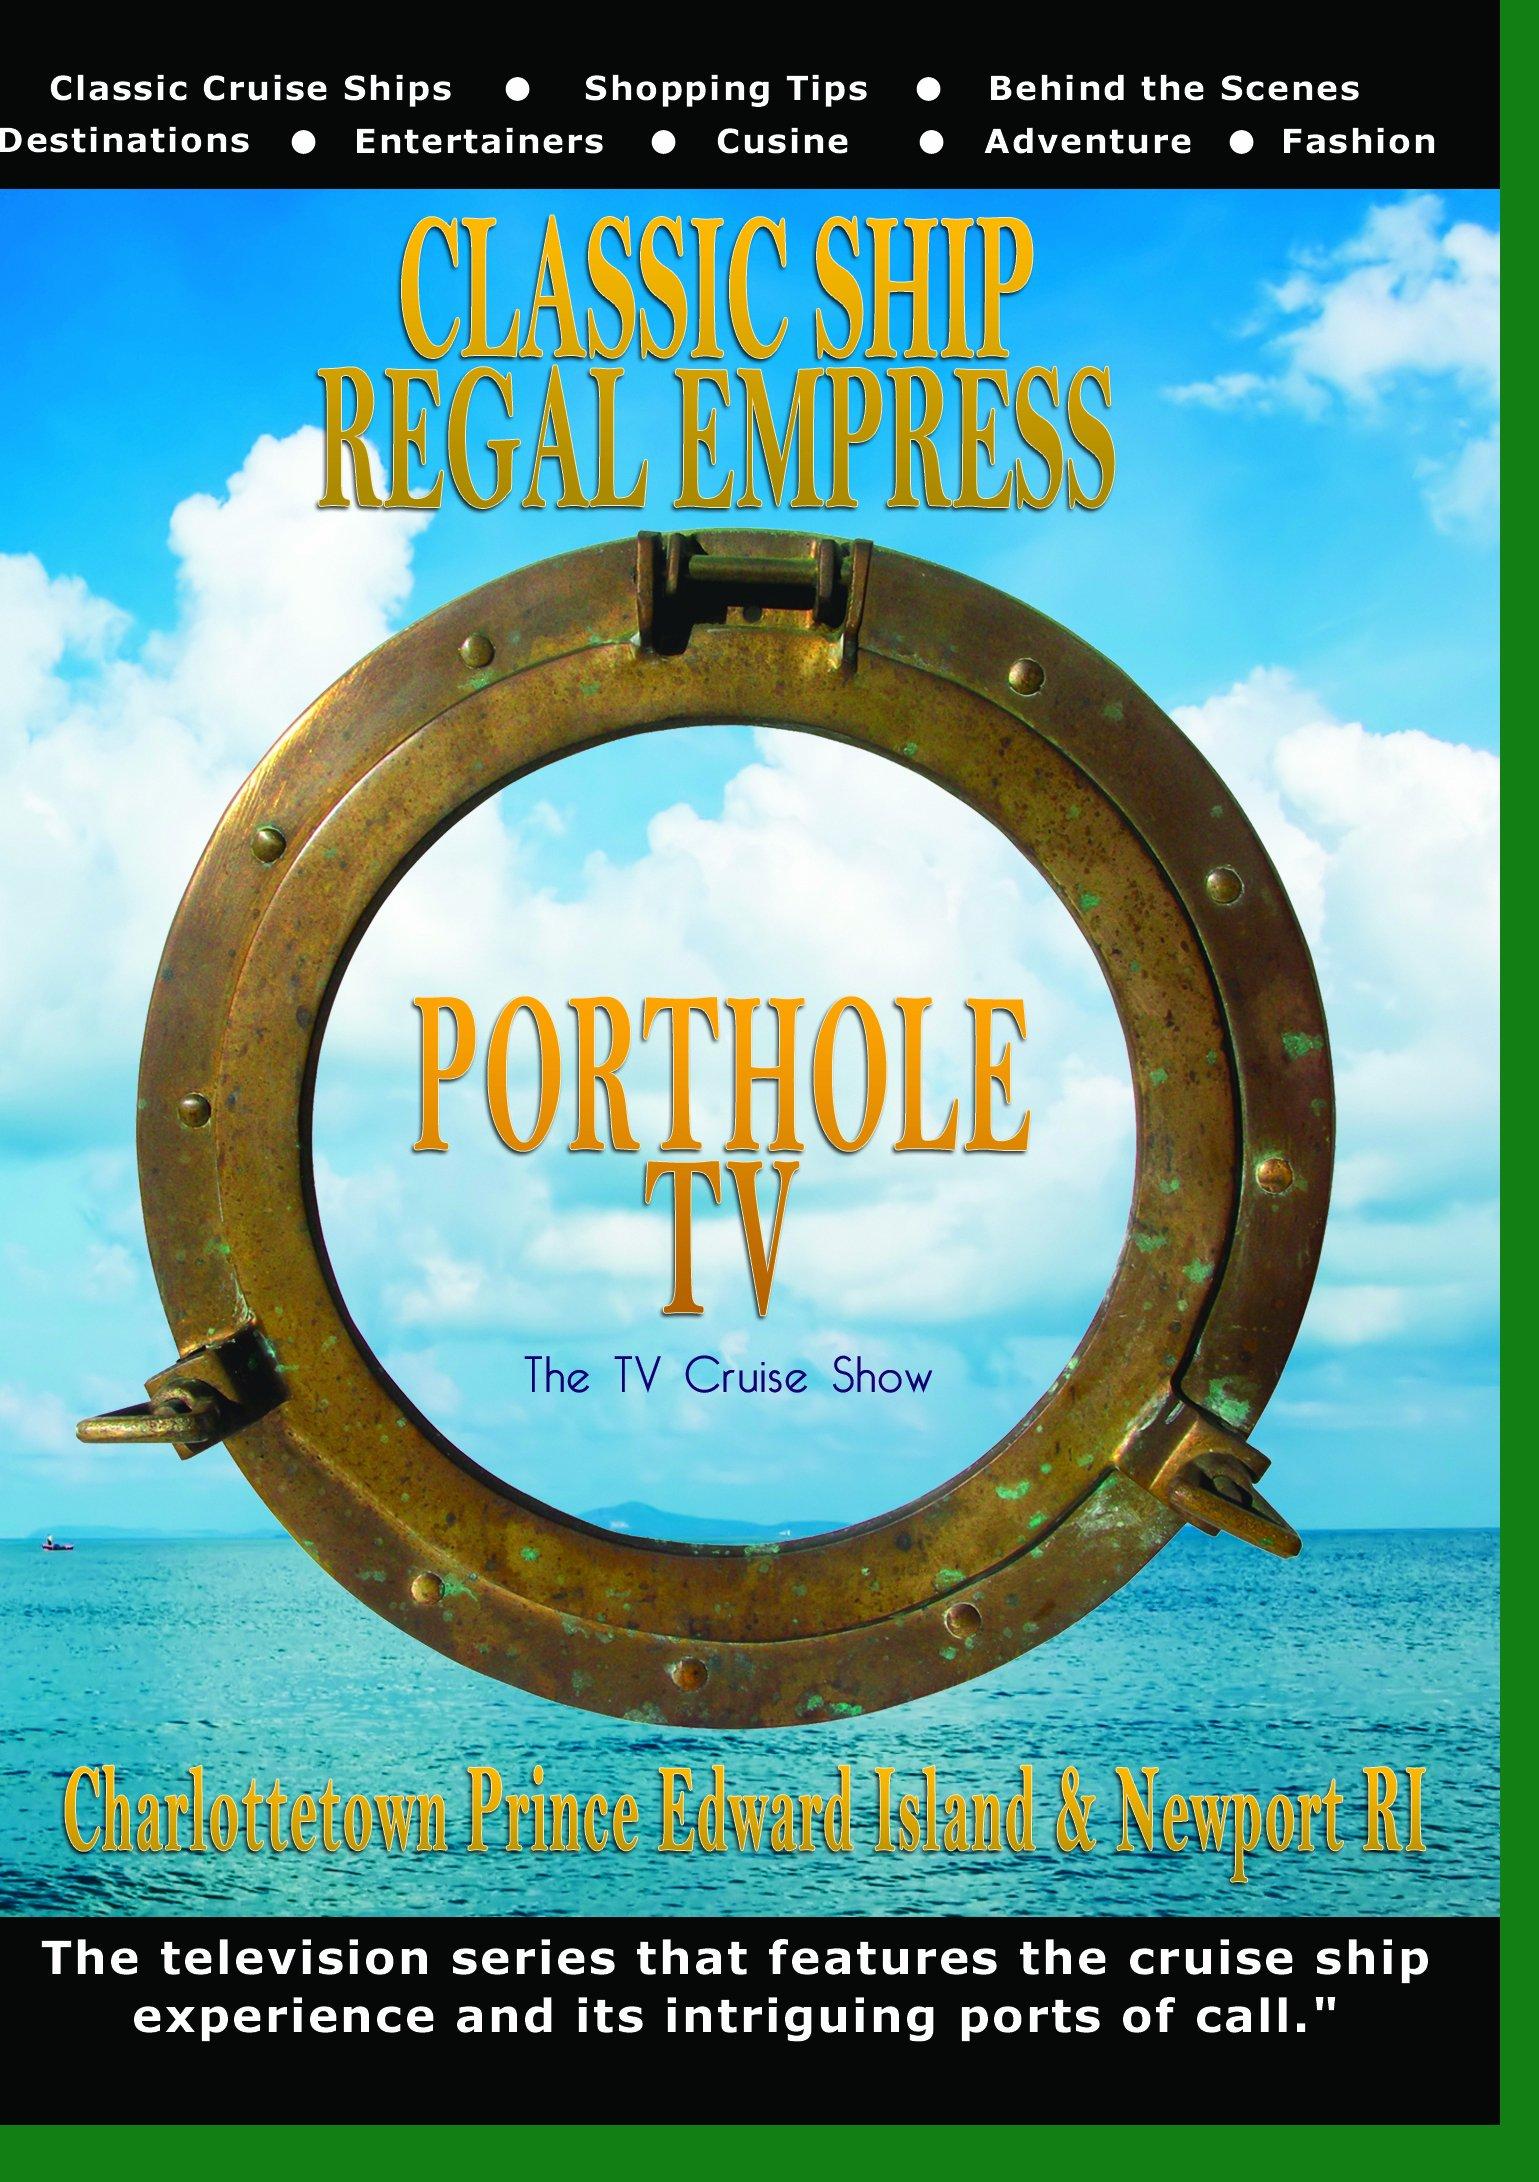 Porthole TV DVD Classic ship: Regal Empress